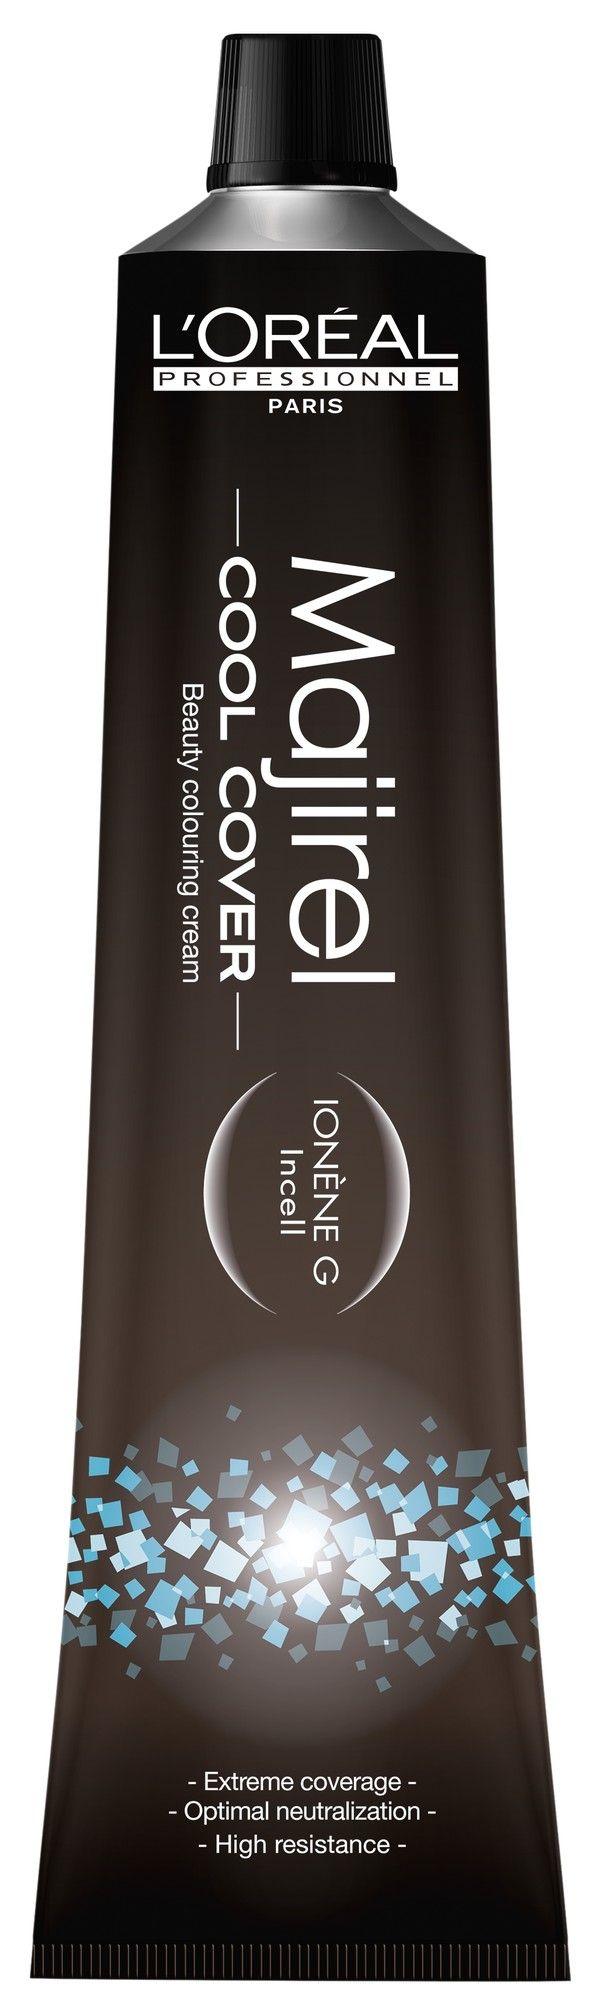 L'Oréal Majirel Cool Cover Moccha 4 88 50ml  Description: Majirel Cool Cover Moccha  Price: 6.44  Meer informatie  #kapper #haircutter #hair #kapperskorting